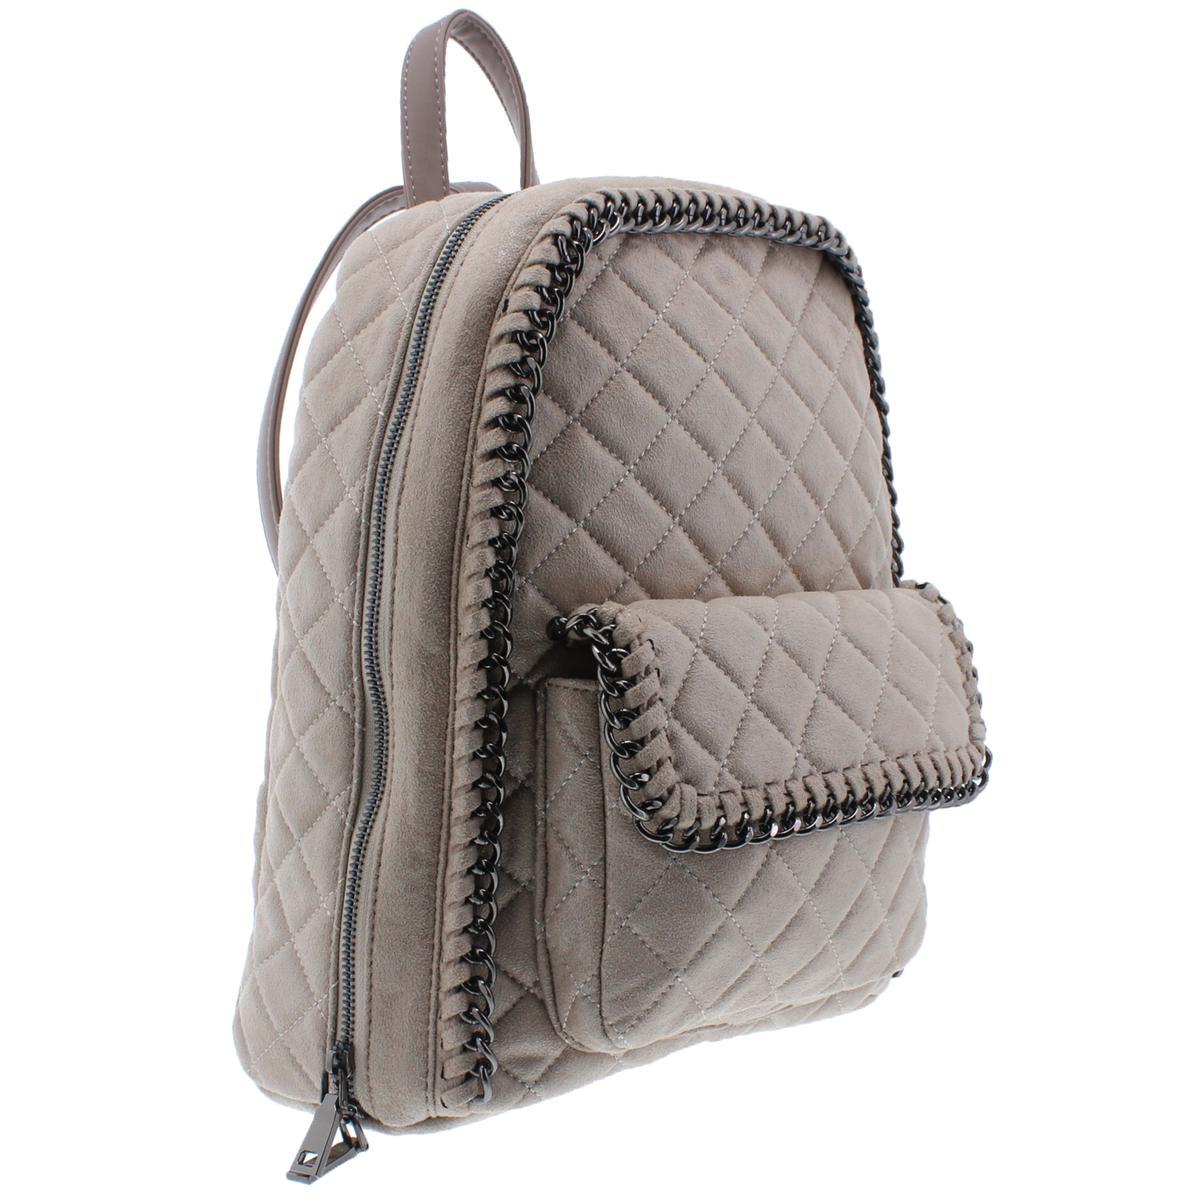 Urban-Expressions-Womens-Caleb-Vegan-Leather-Chain-Trim-Backpack-Purse-BHFO-7489 thumbnail 9